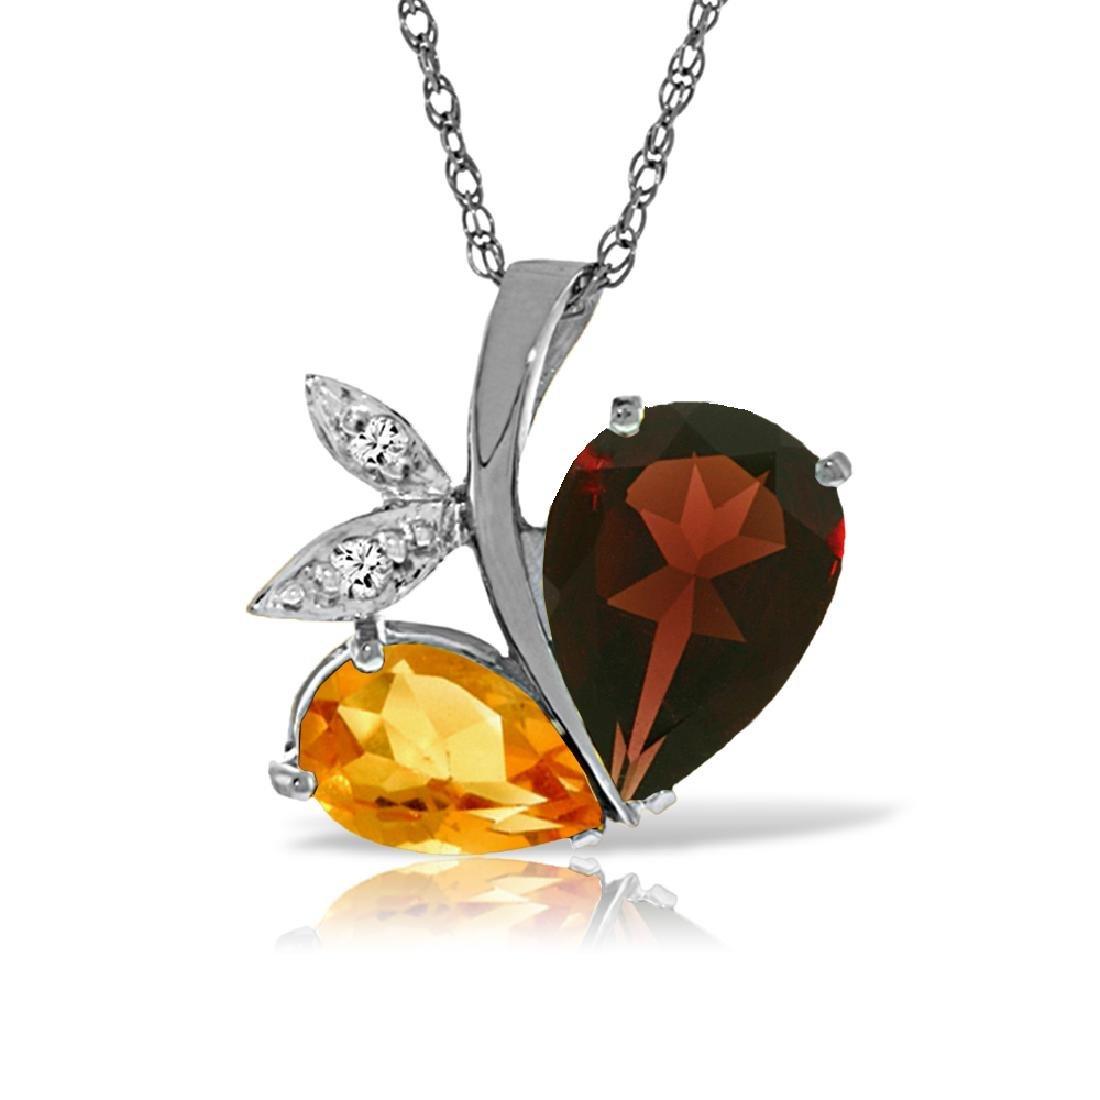 Genuine 5.06 ctw Garnet, Citrine & Diamond Necklace